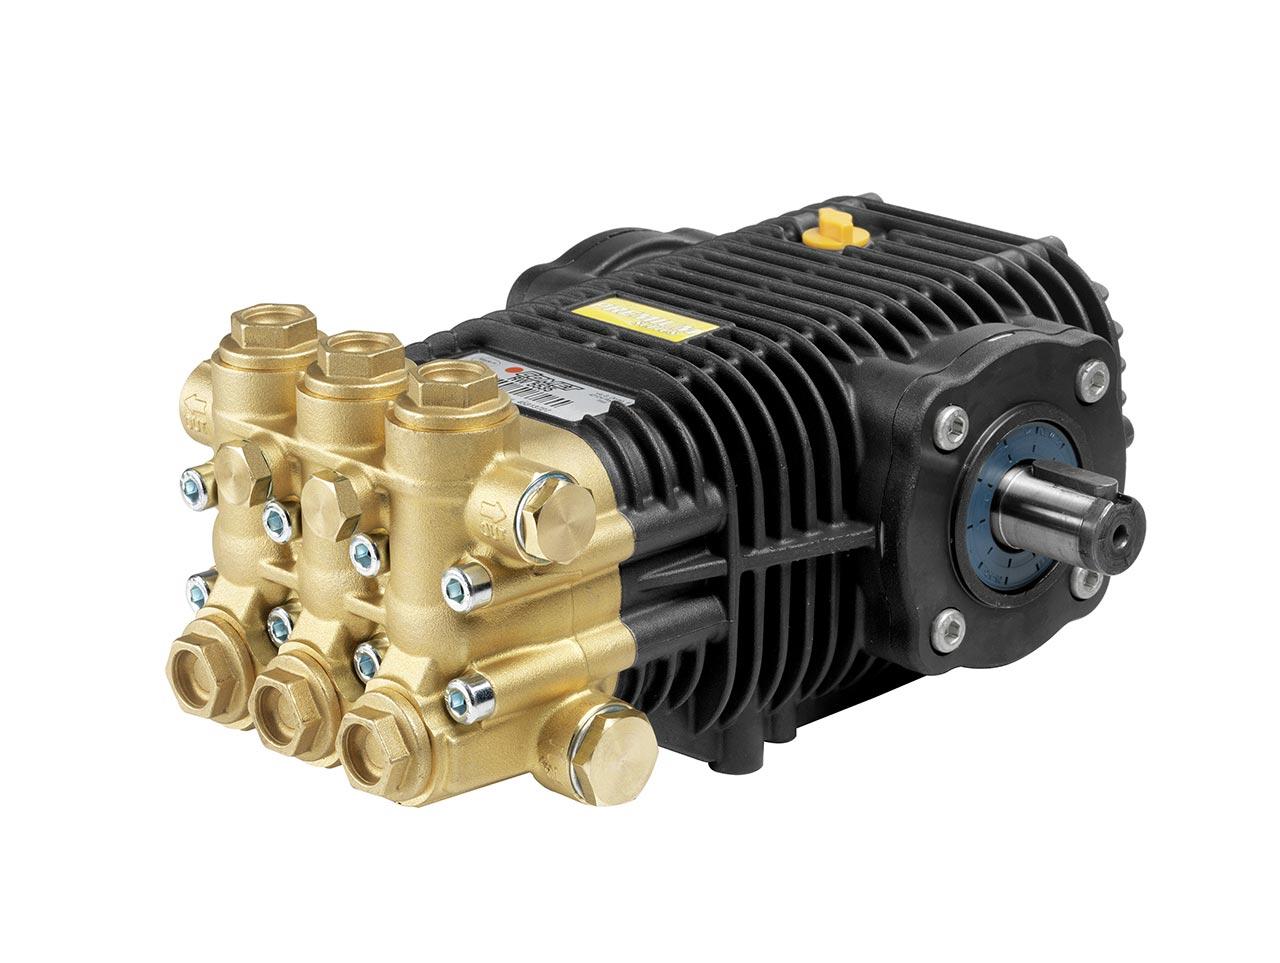 K-891-991-TS-RW Premium engine water cleaners Comet